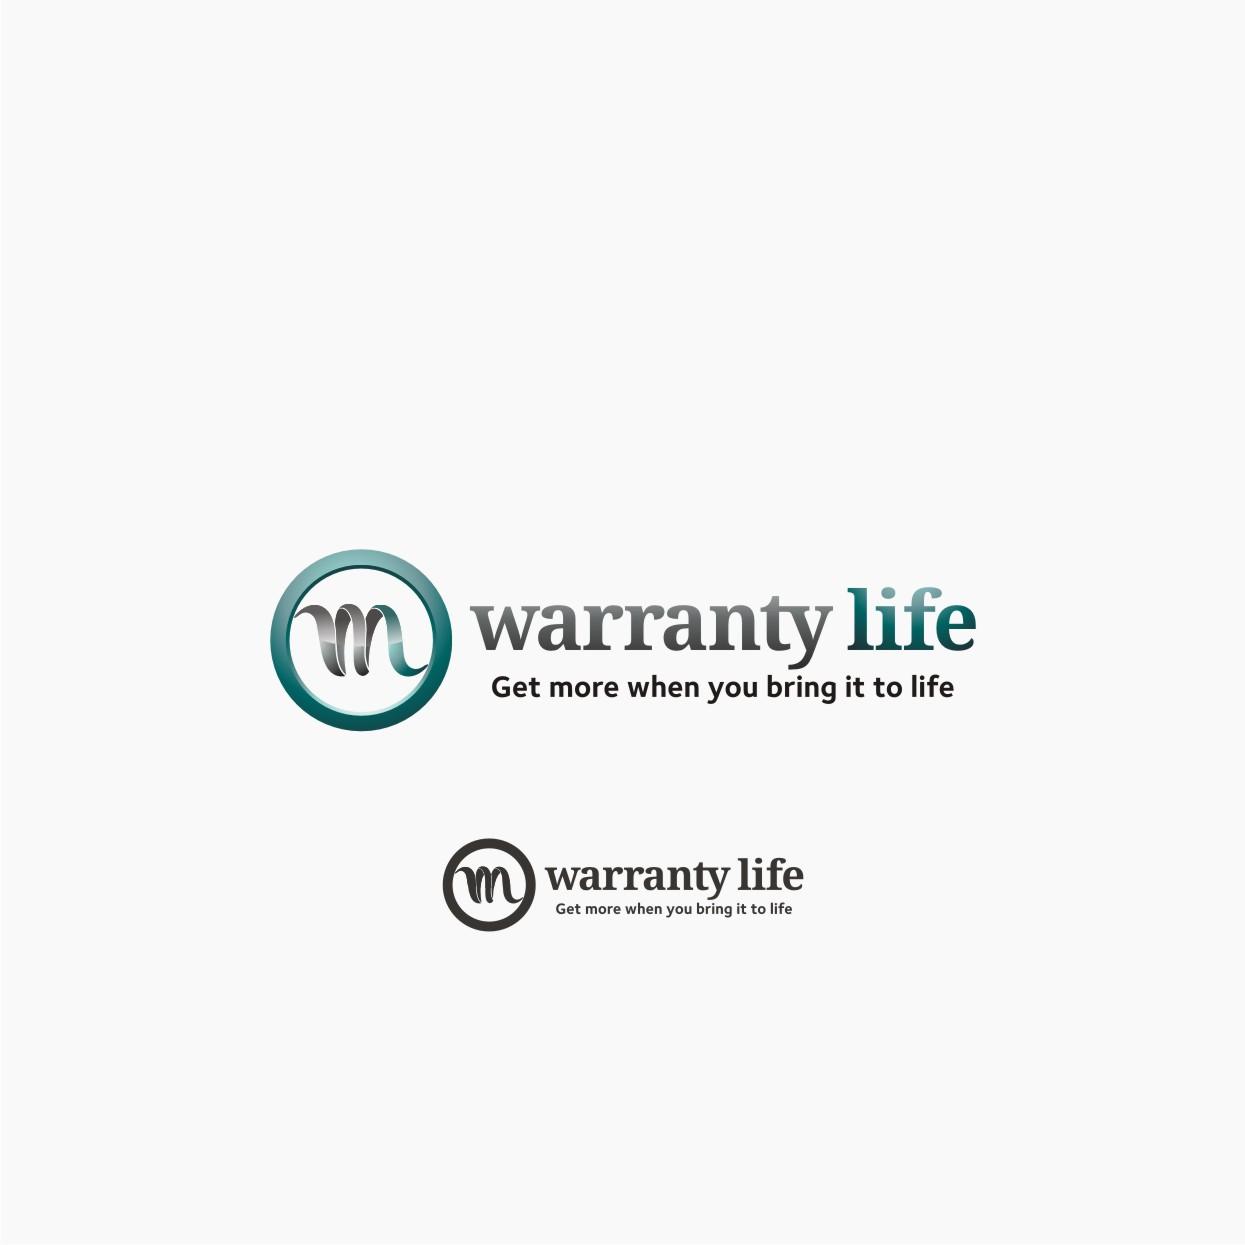 Logo Design by graphicleaf - Entry No. 70 in the Logo Design Contest WarrantyLife Logo Design.